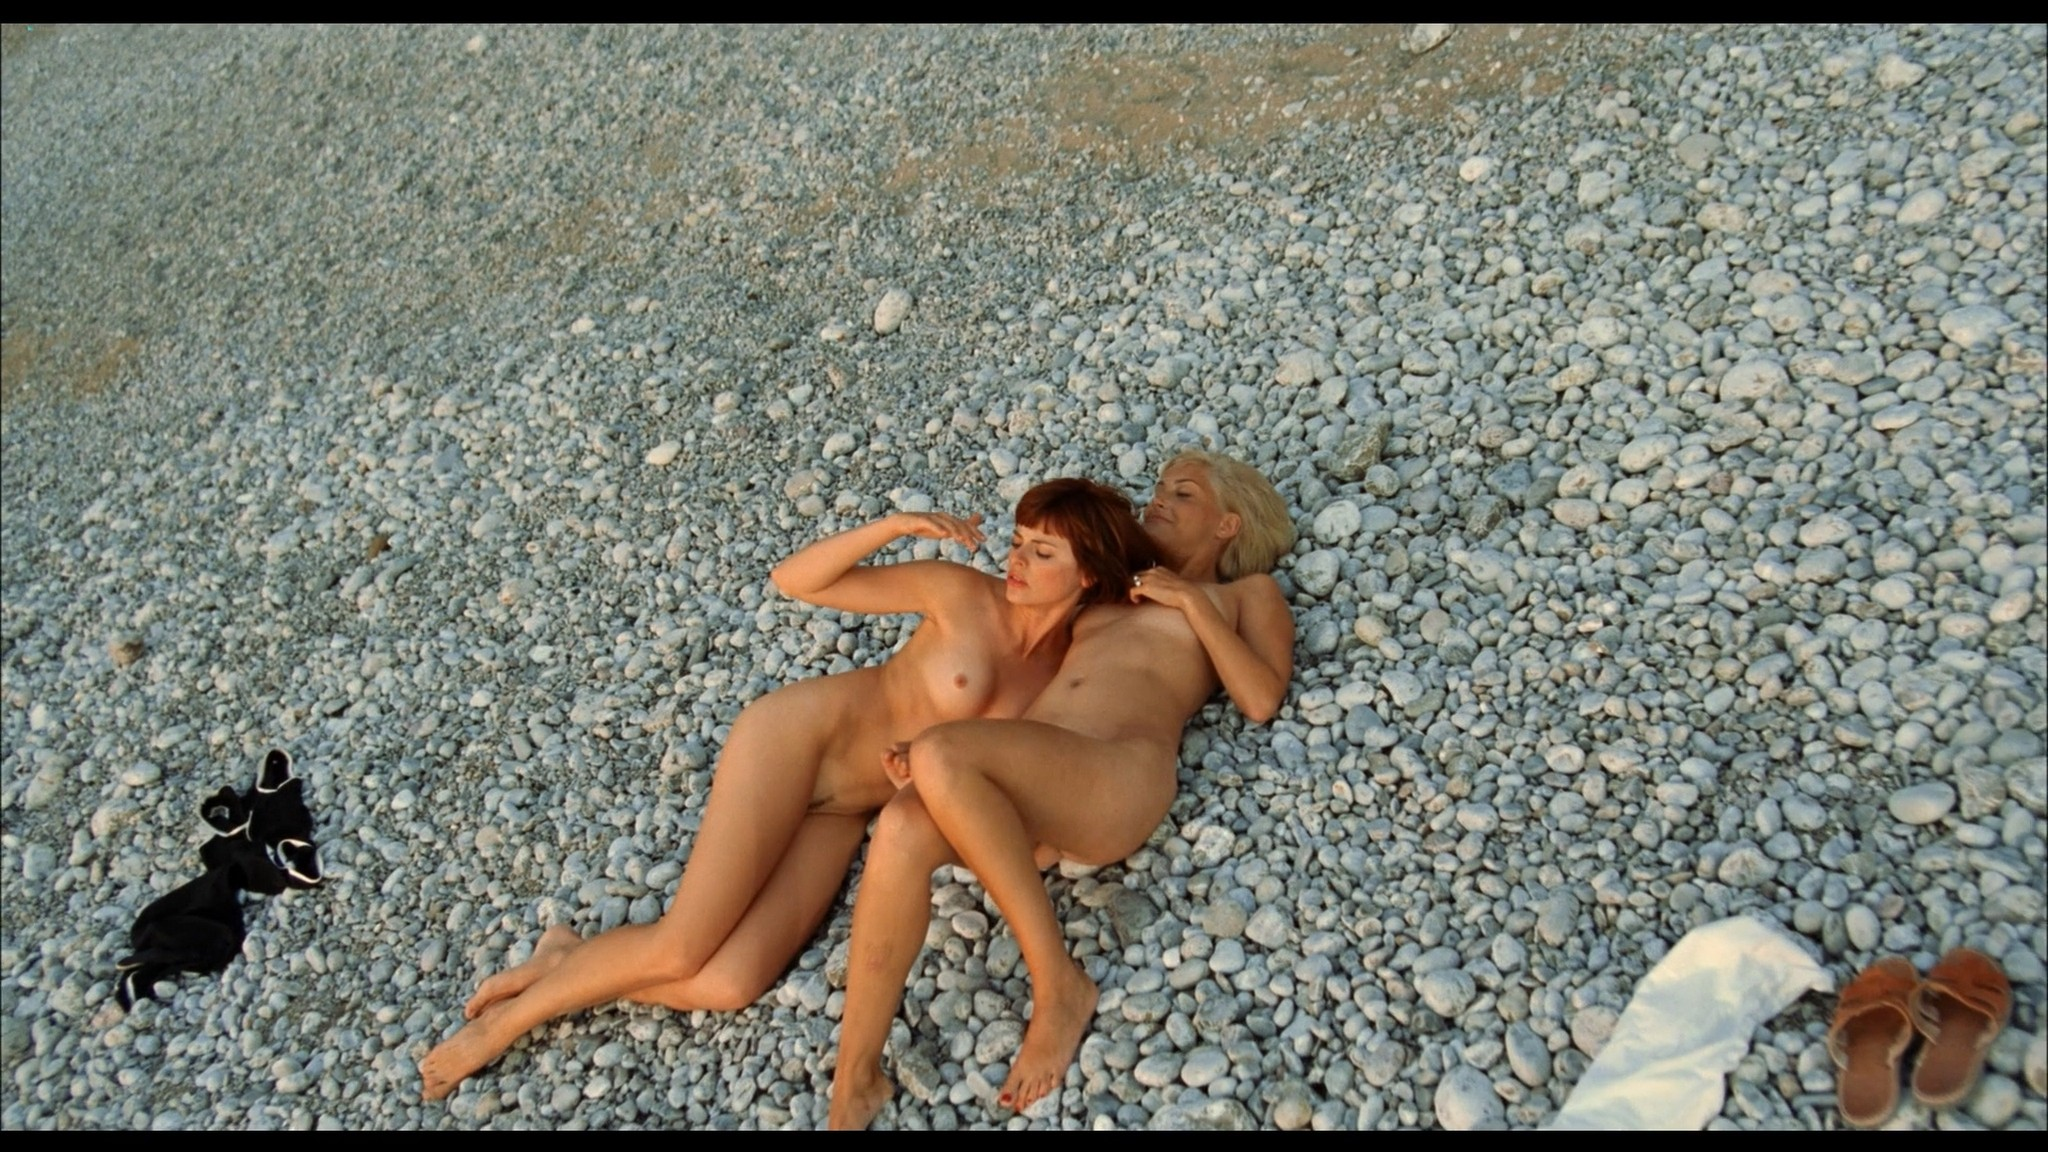 Avalon Barrie nude and Lyudmila Shiryaeva nude full frontal Sappho 2008 HD 1080p BluRay REMUX 19